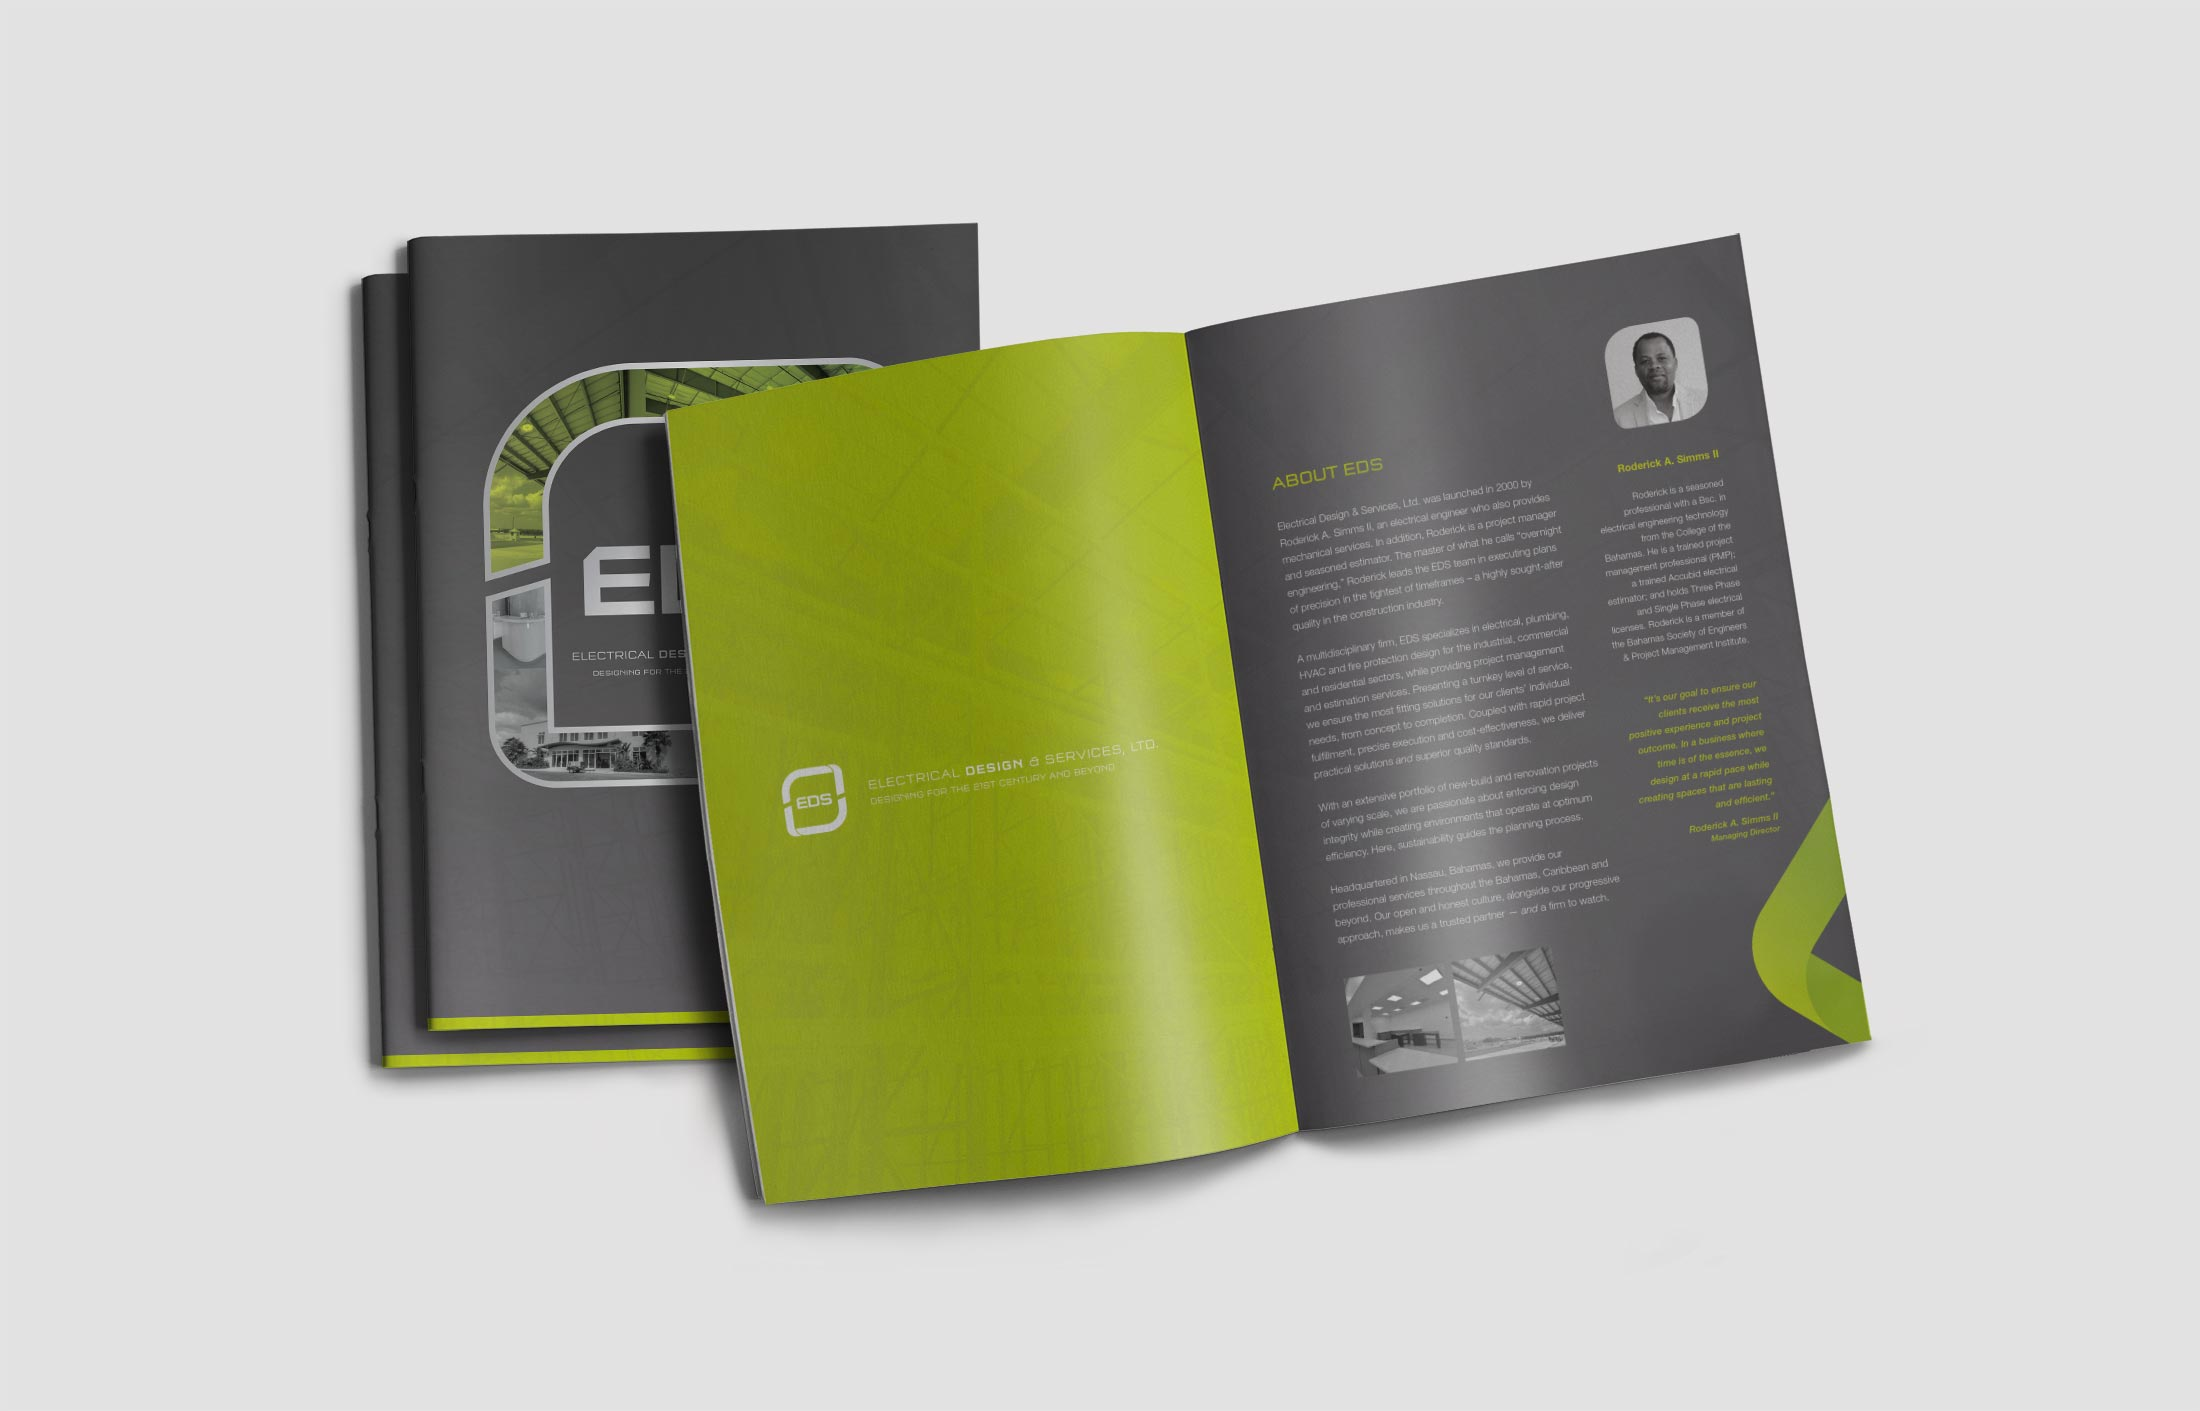 eds brochure dossier design